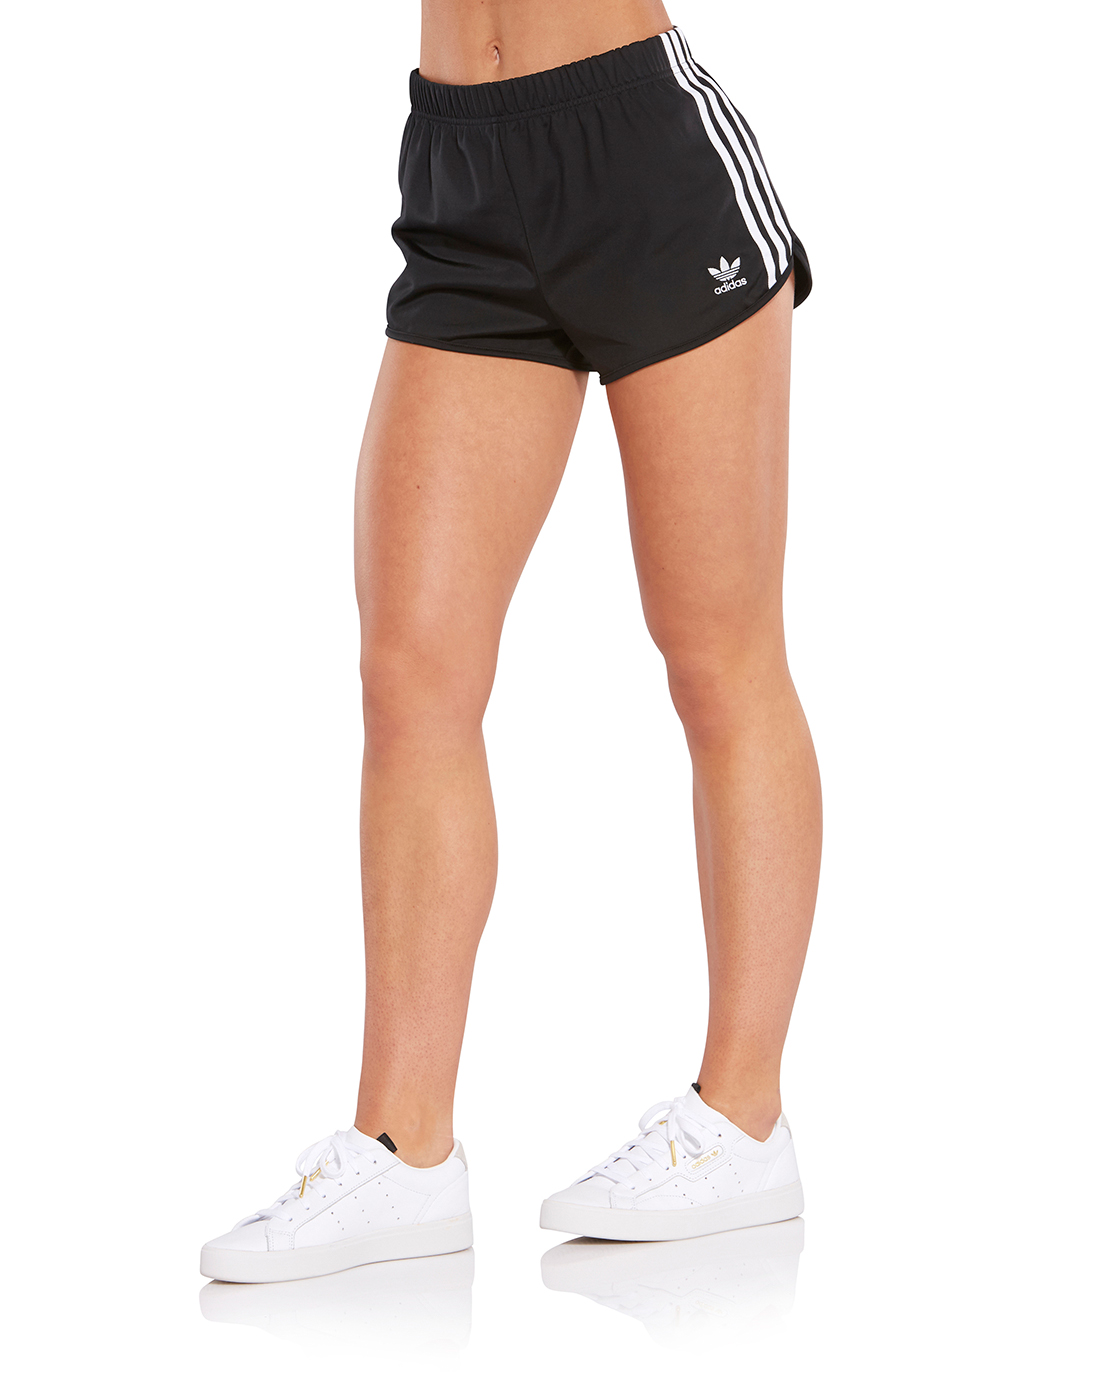 de0363c8 Women's Black adidas Originals Shorts | Life Style Sports